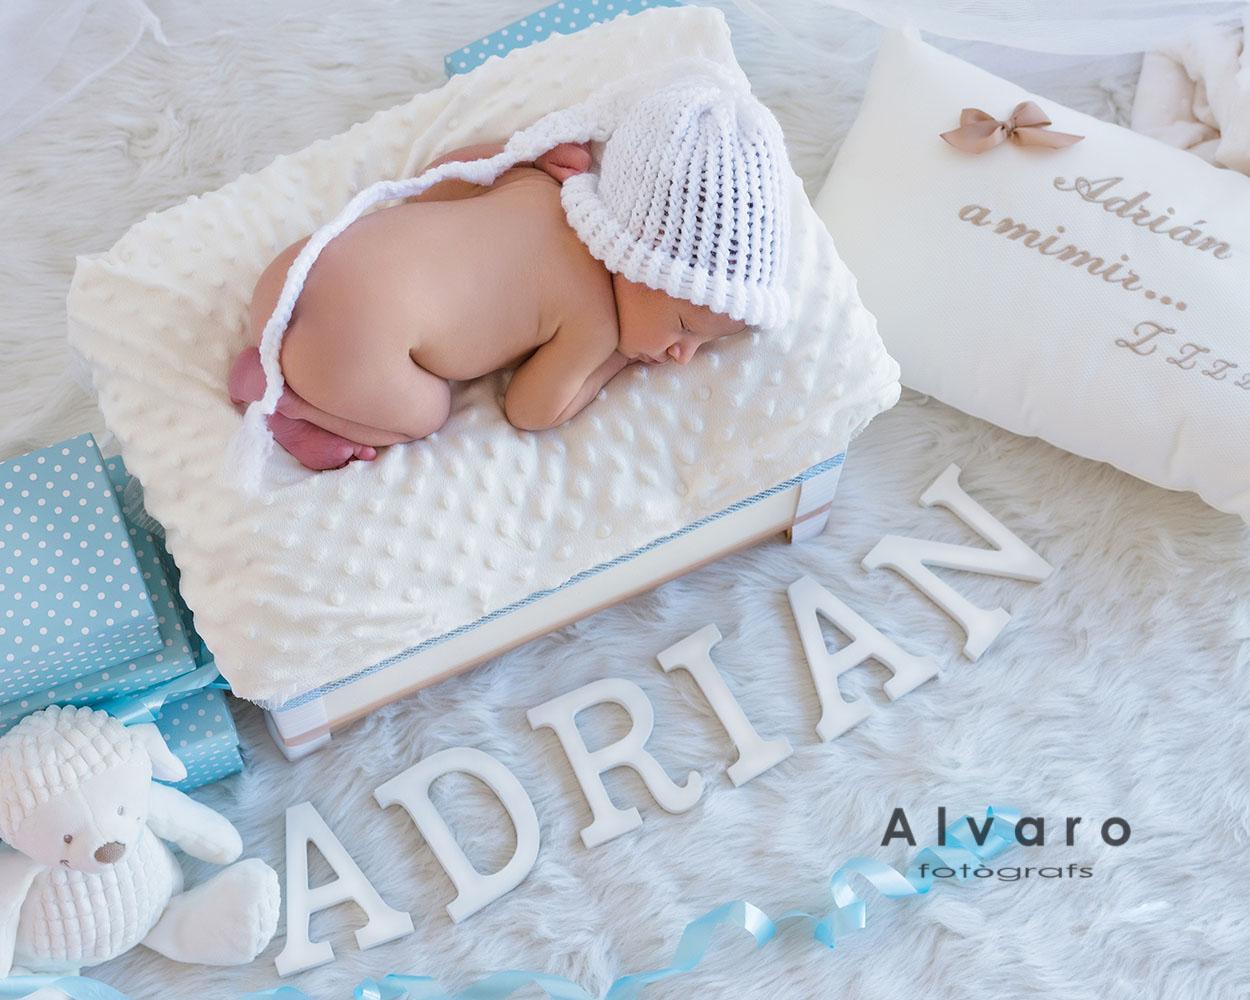 adrian3